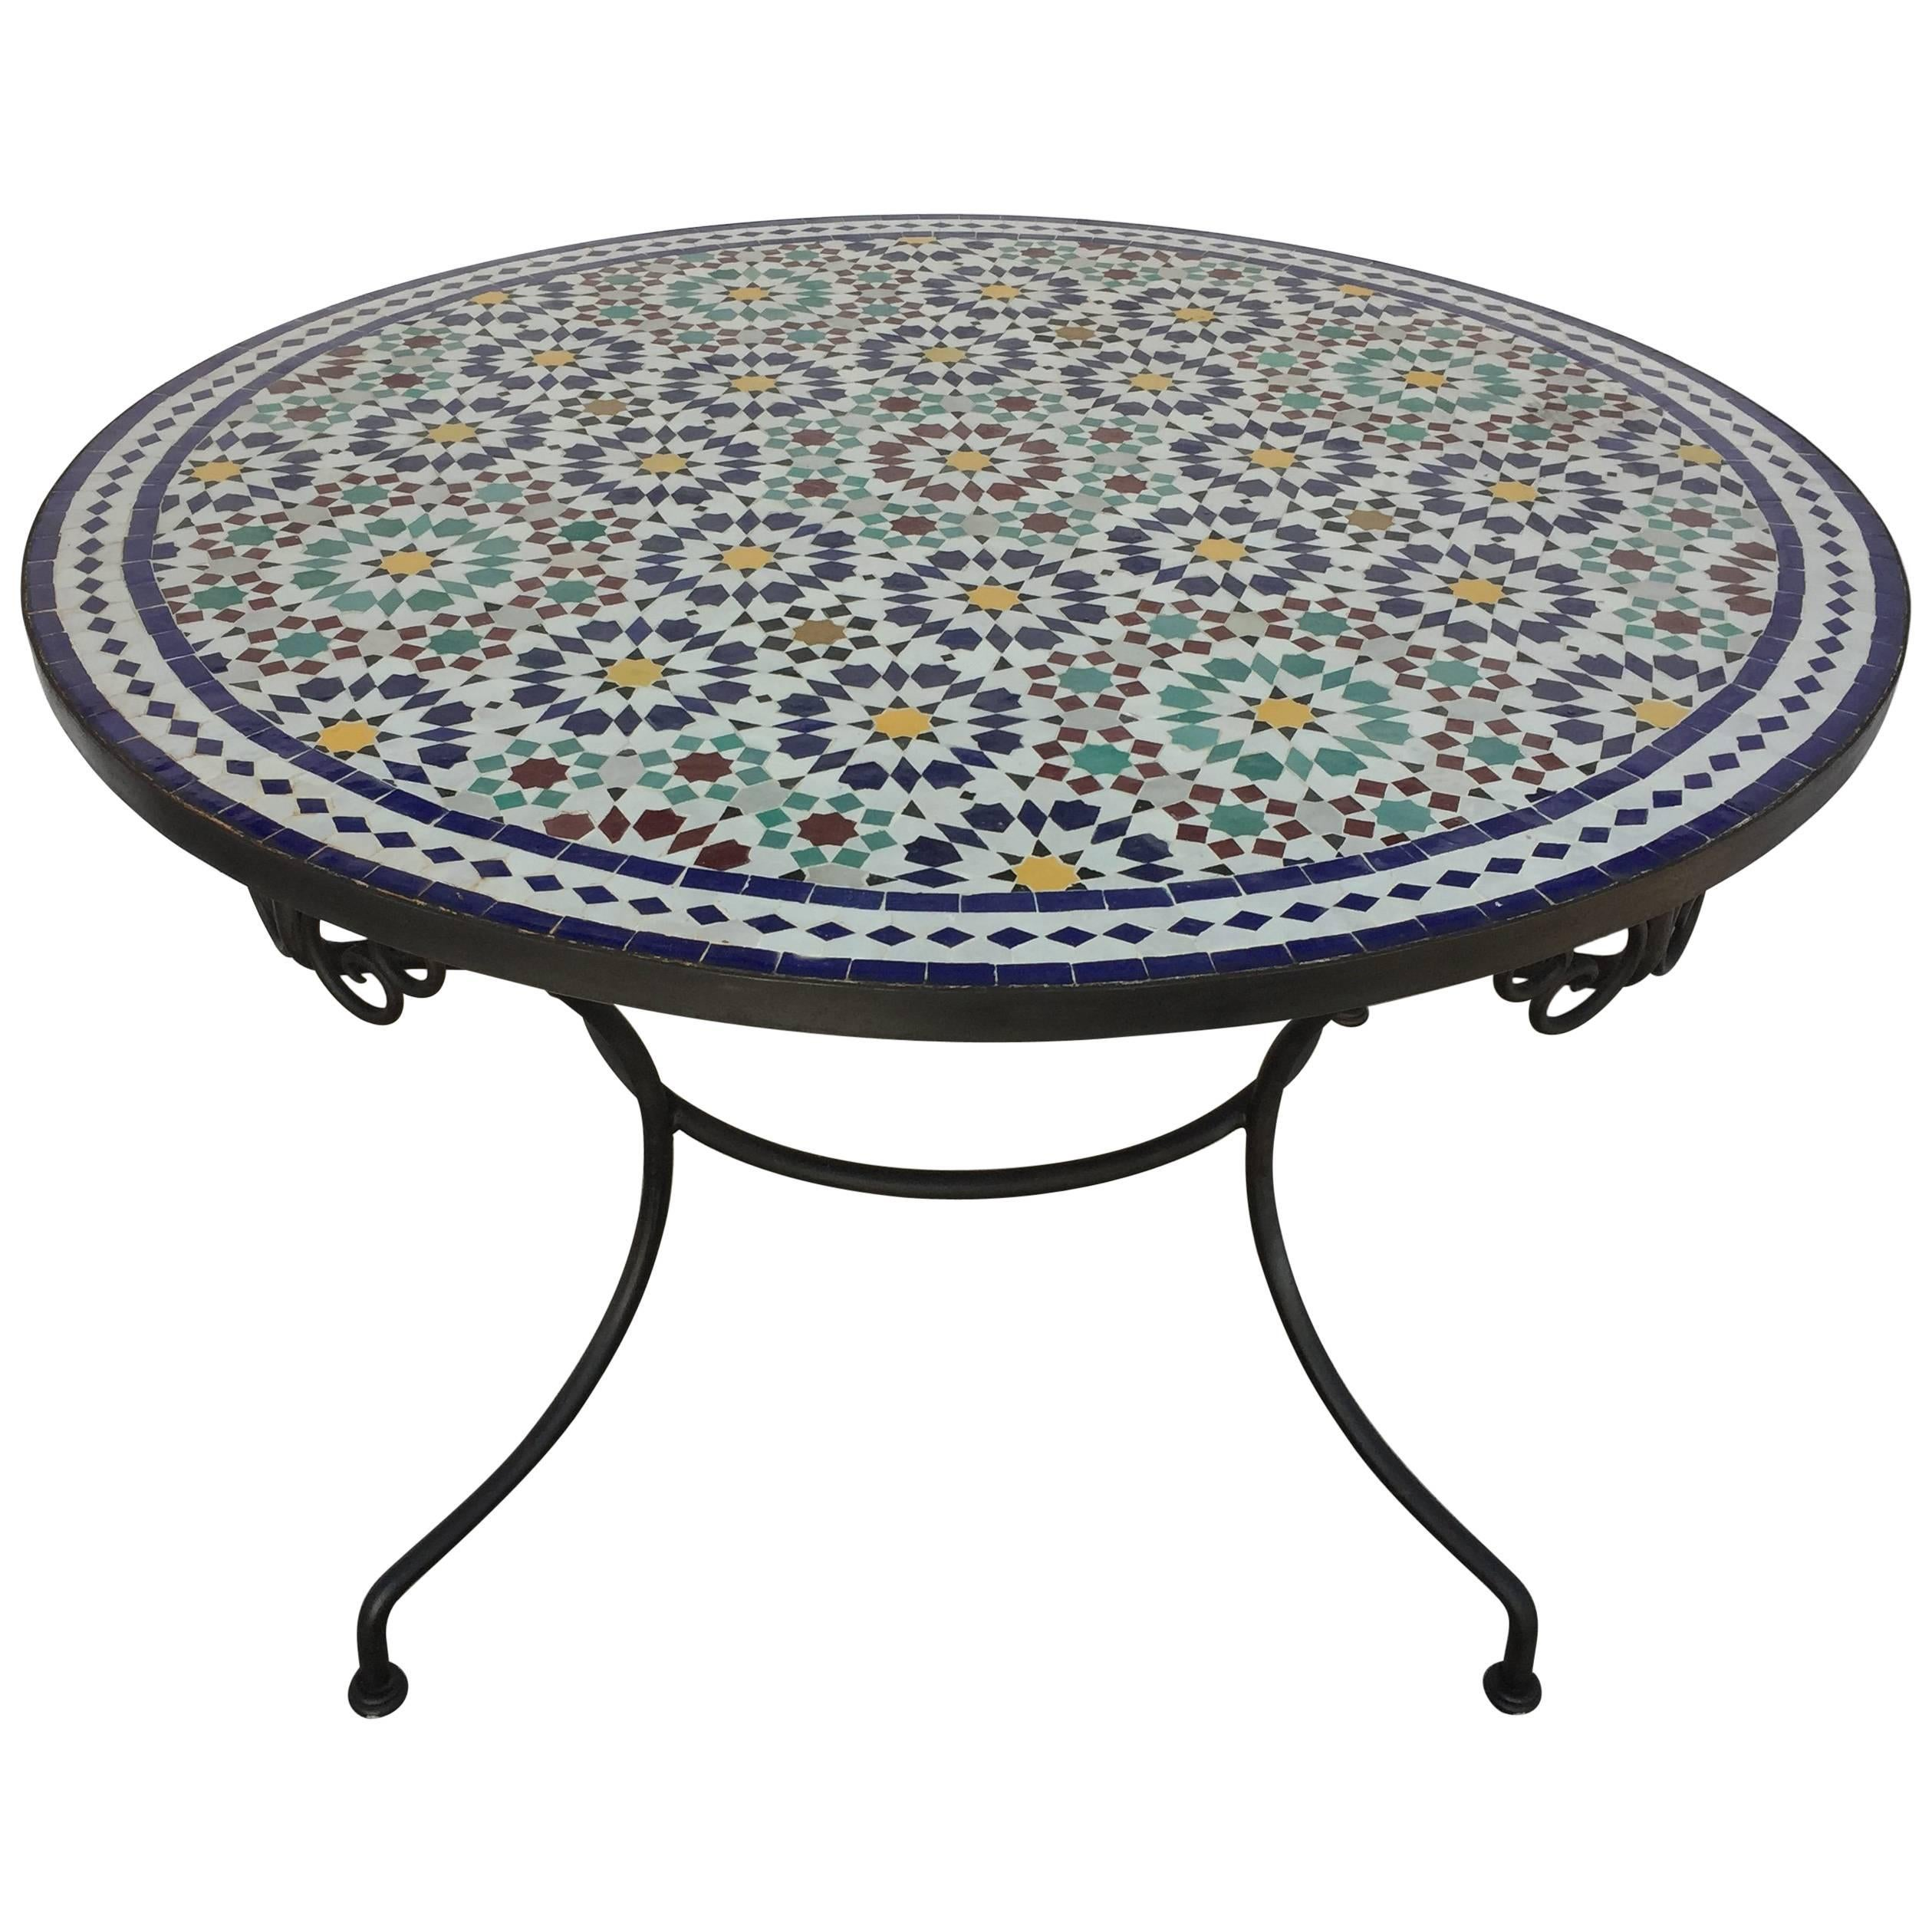 Moroccan Round Mosaic Outdoor Tile Table in Fez Moorish Design